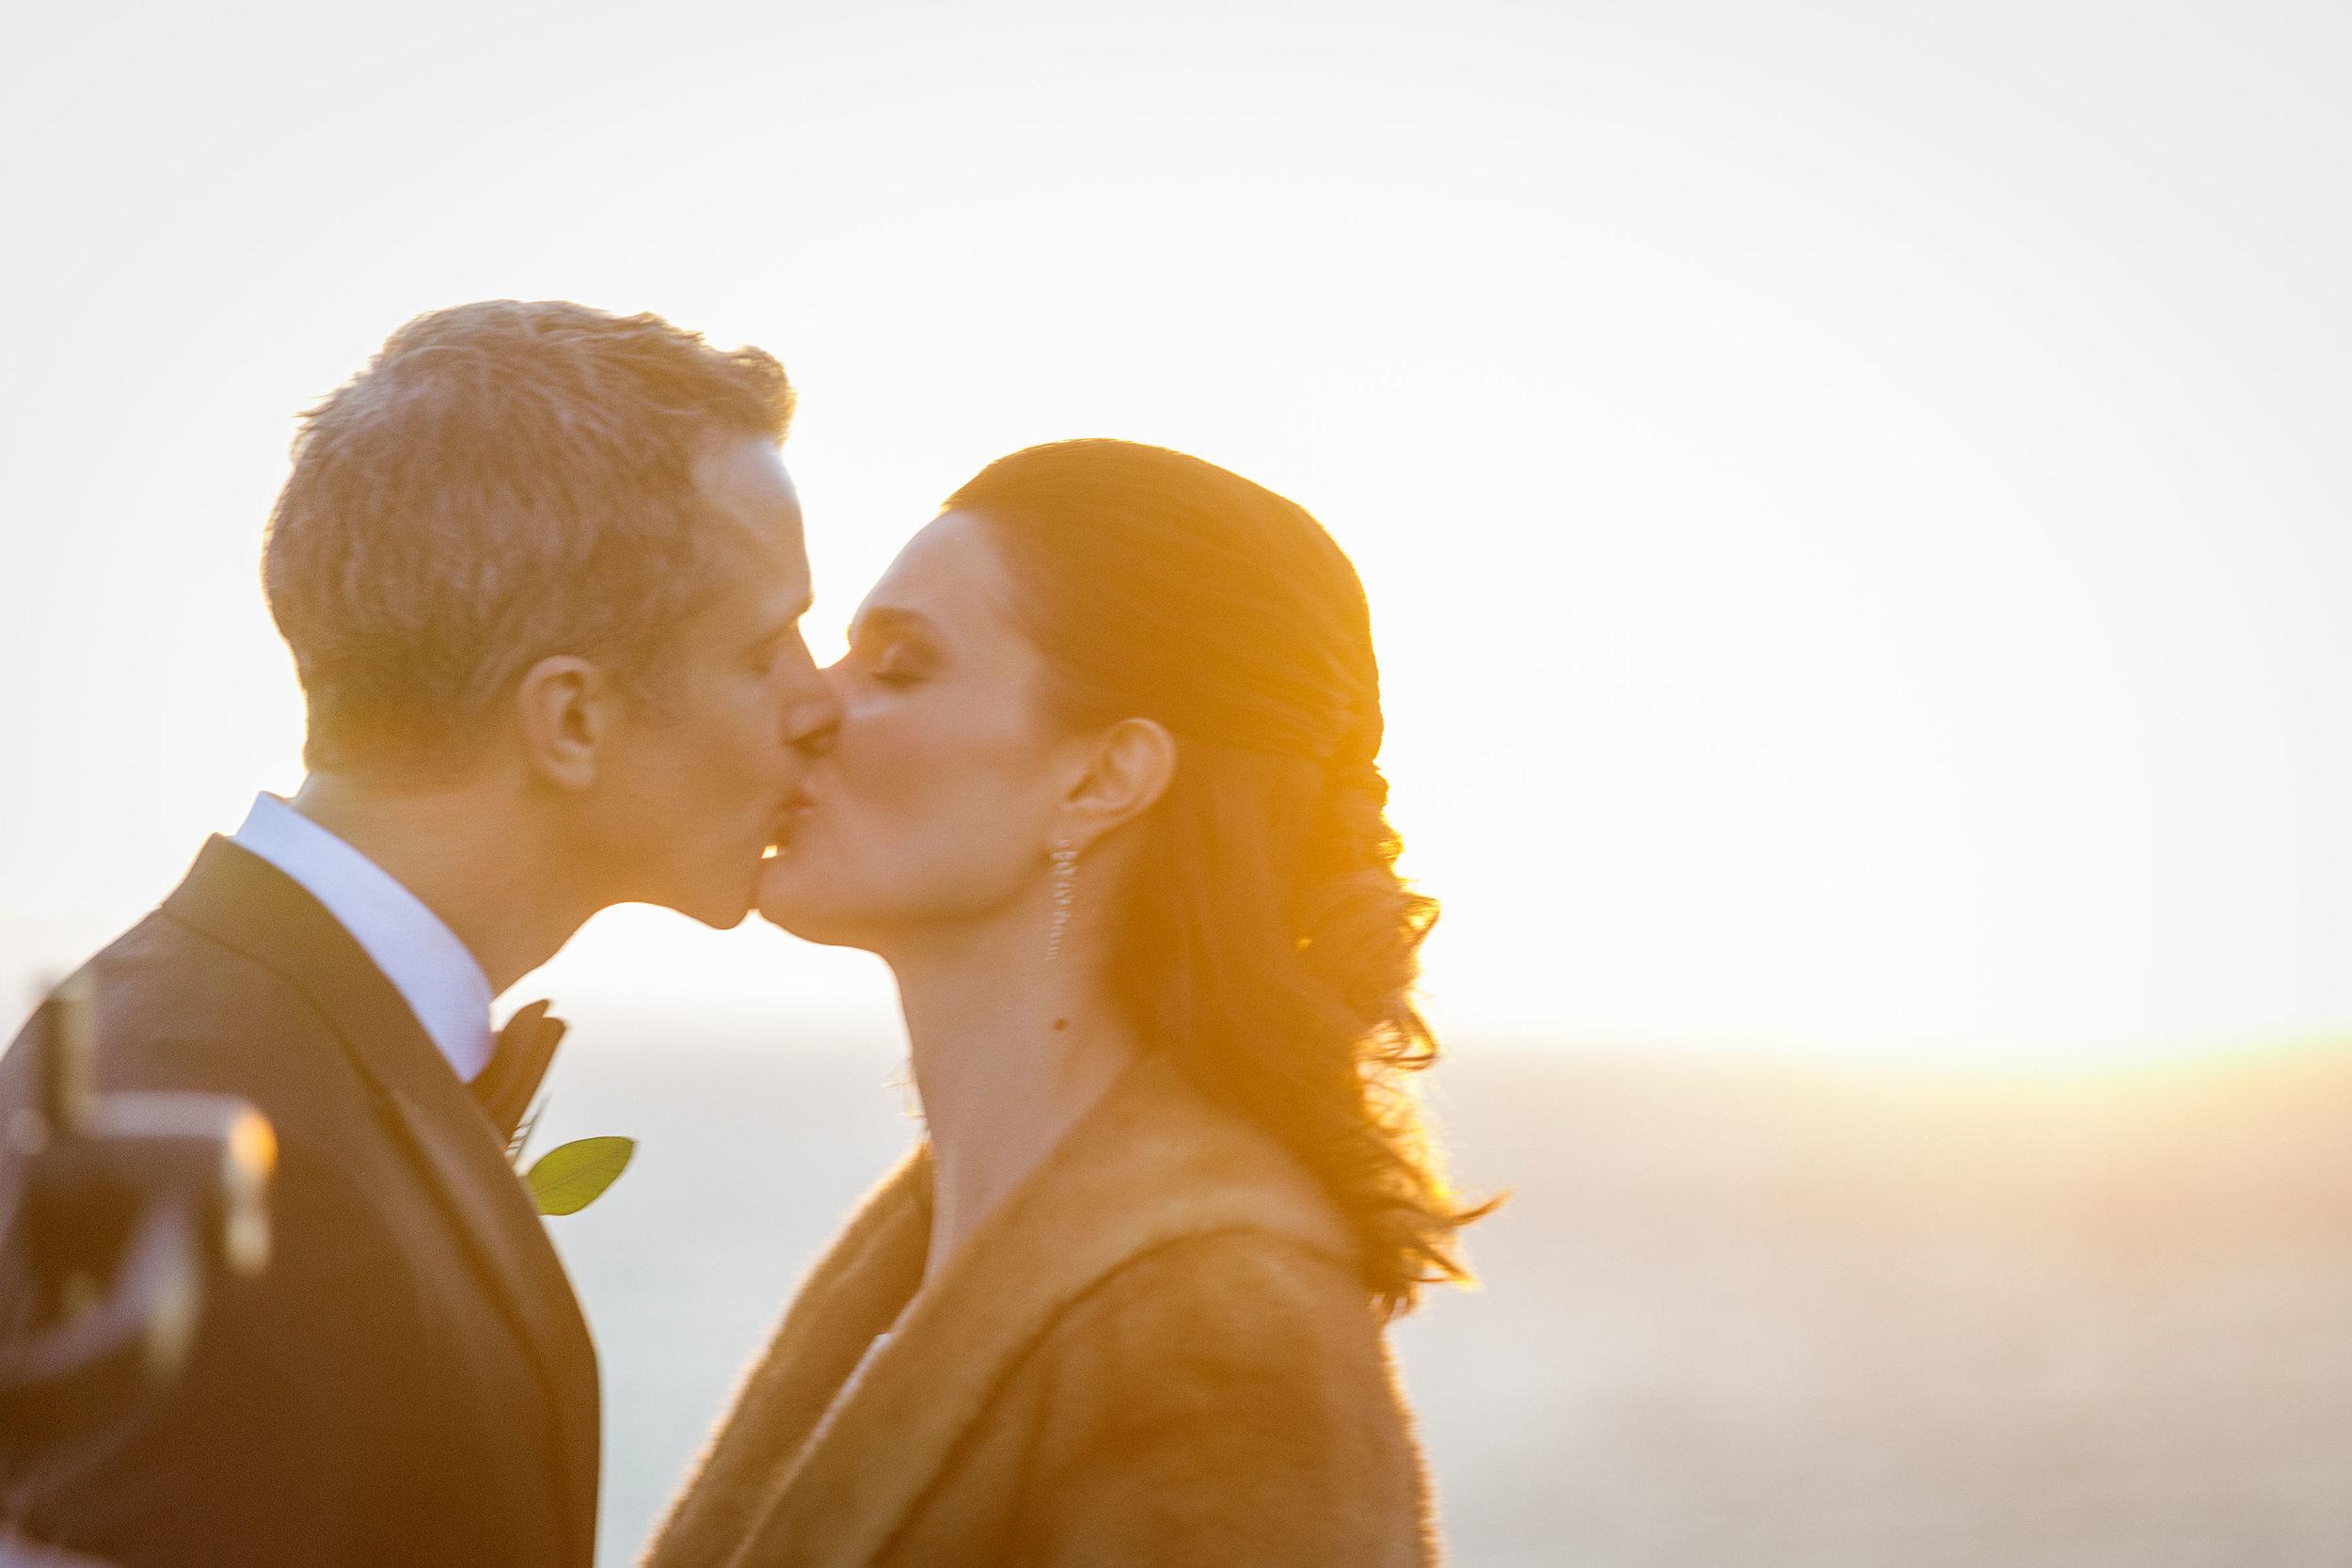 www.santabarbarawedding.com   Kiel Rucker Photography   The Ritz Carlton Bacara   Event of the Season   Cody Floral Design   A Kiss at Sunset